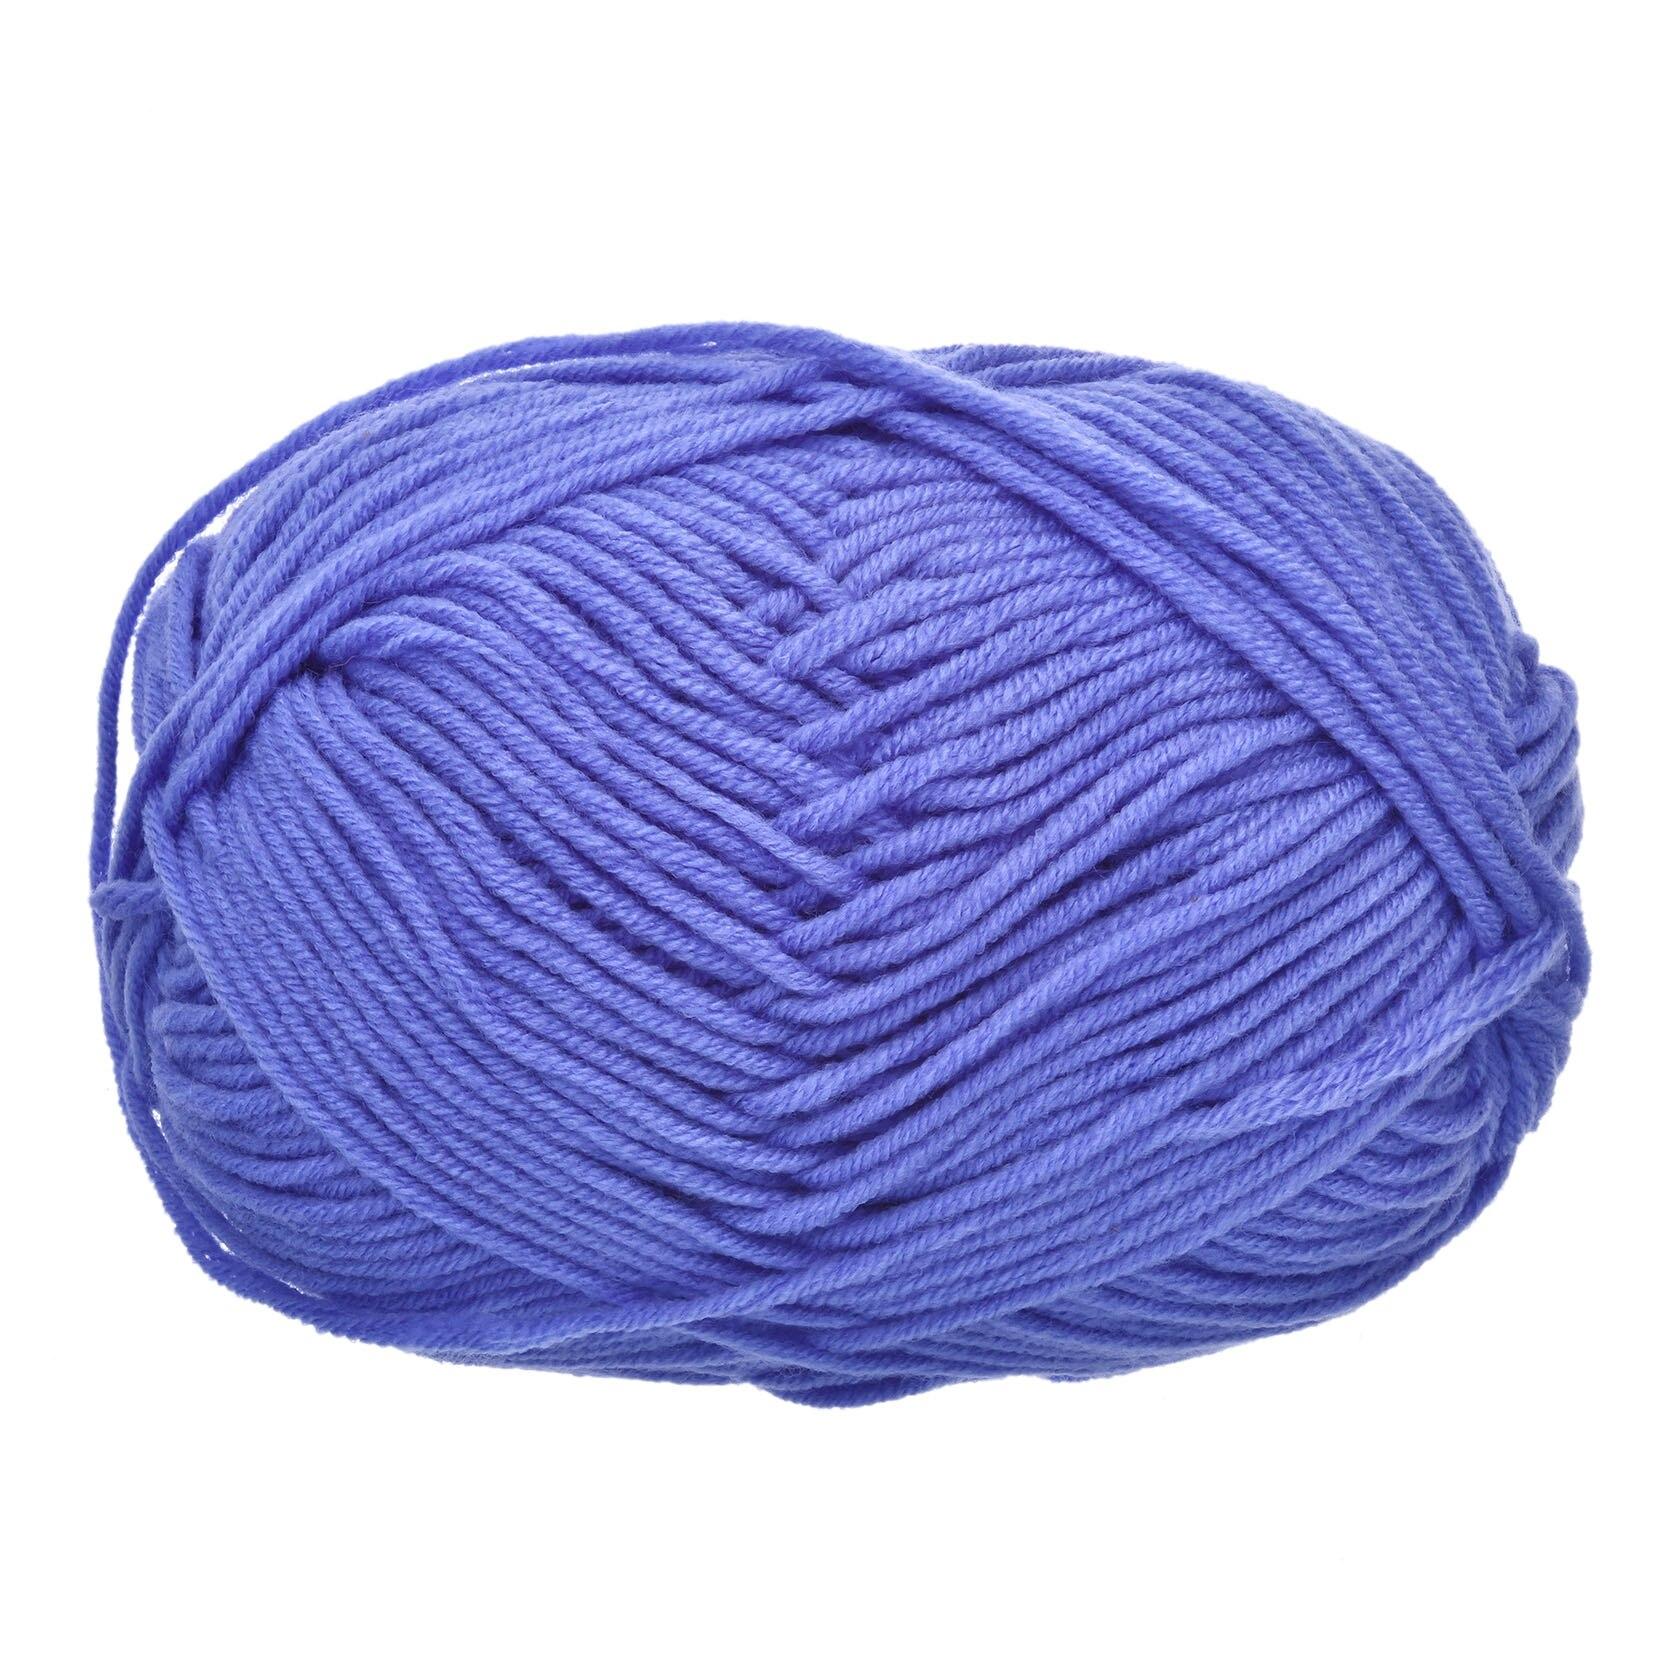 Thread where to buy ice picks in bulk - 2pcs 50g Medium Thickness Thread Knitting Line Crochet Woolen Yarn China